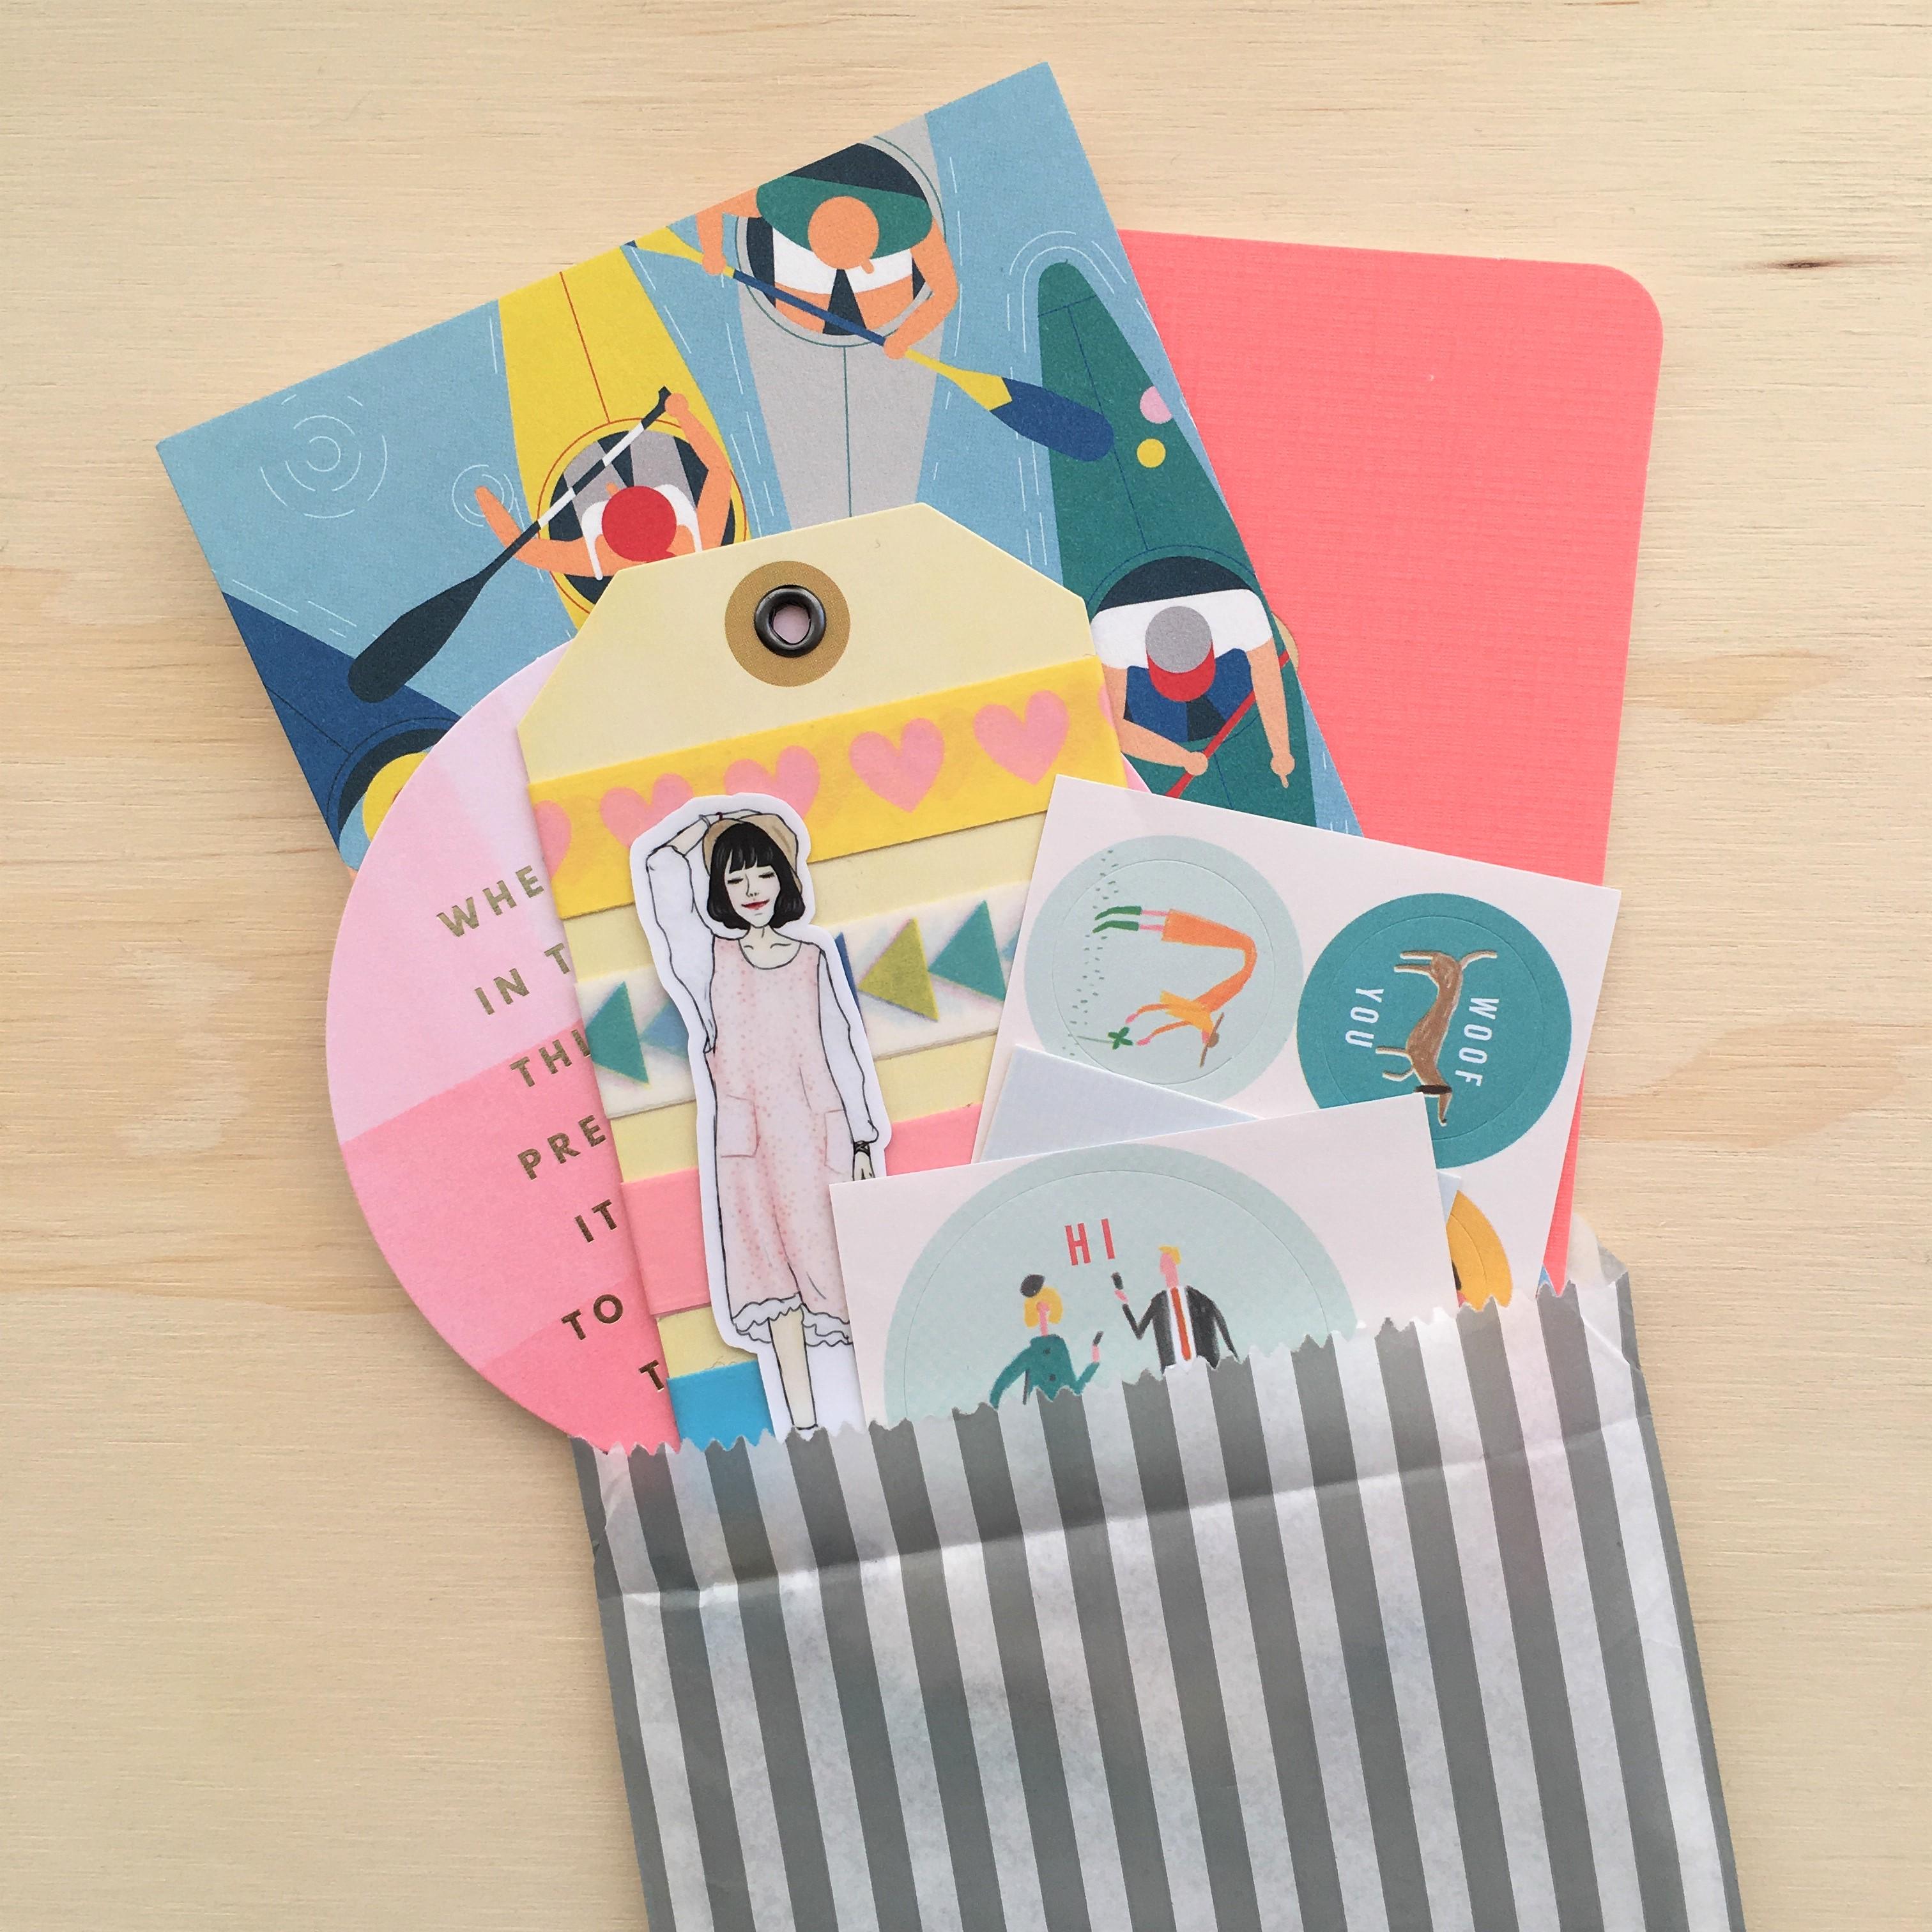 Snail Mail Kit Etsy Sandeep Beep